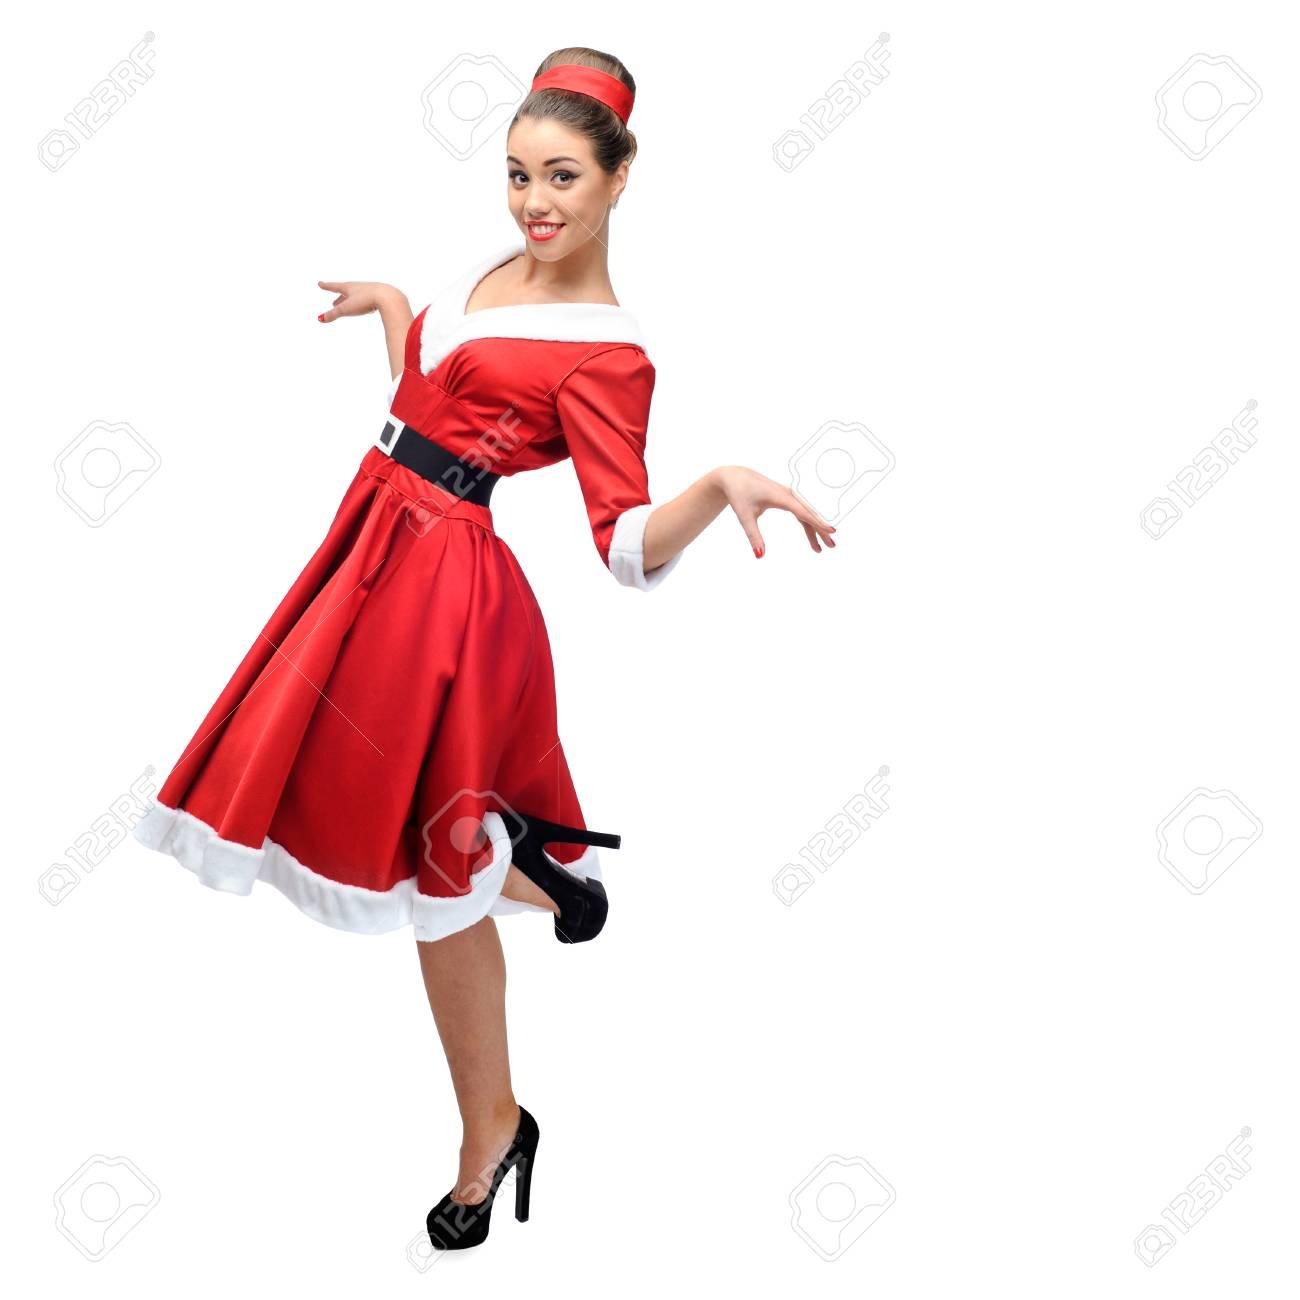 Vintage Kleding.Vrolijke Jonge Blanke Vrouw In Rode Vintage Kleding Dansen